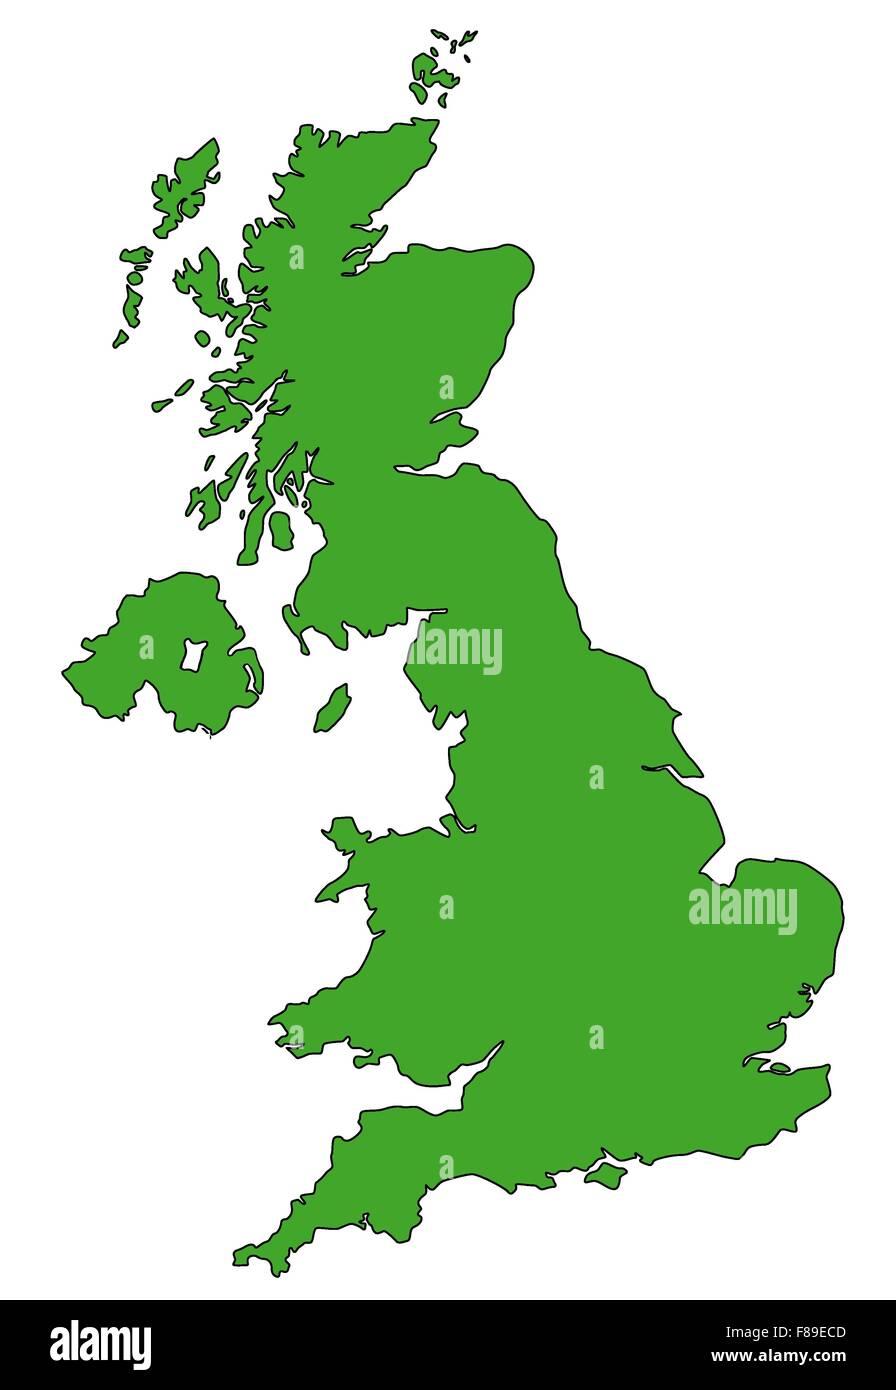 Map Of England Ireland Scotland And Wales.England Ireland Scotland Wales Map Stock Photos England Ireland